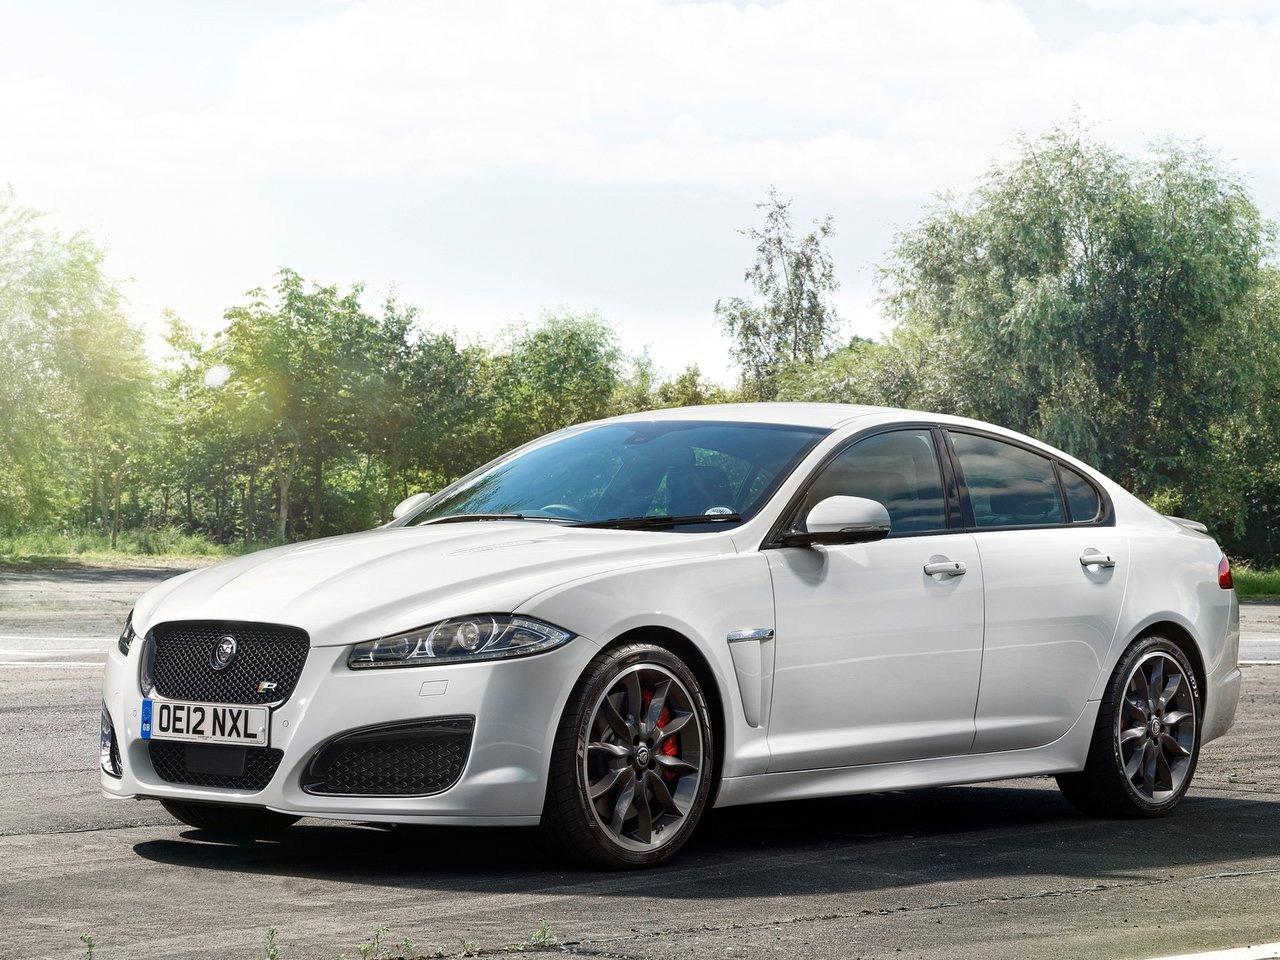 2013 Jaguar XFR Speed | Cars Sketches